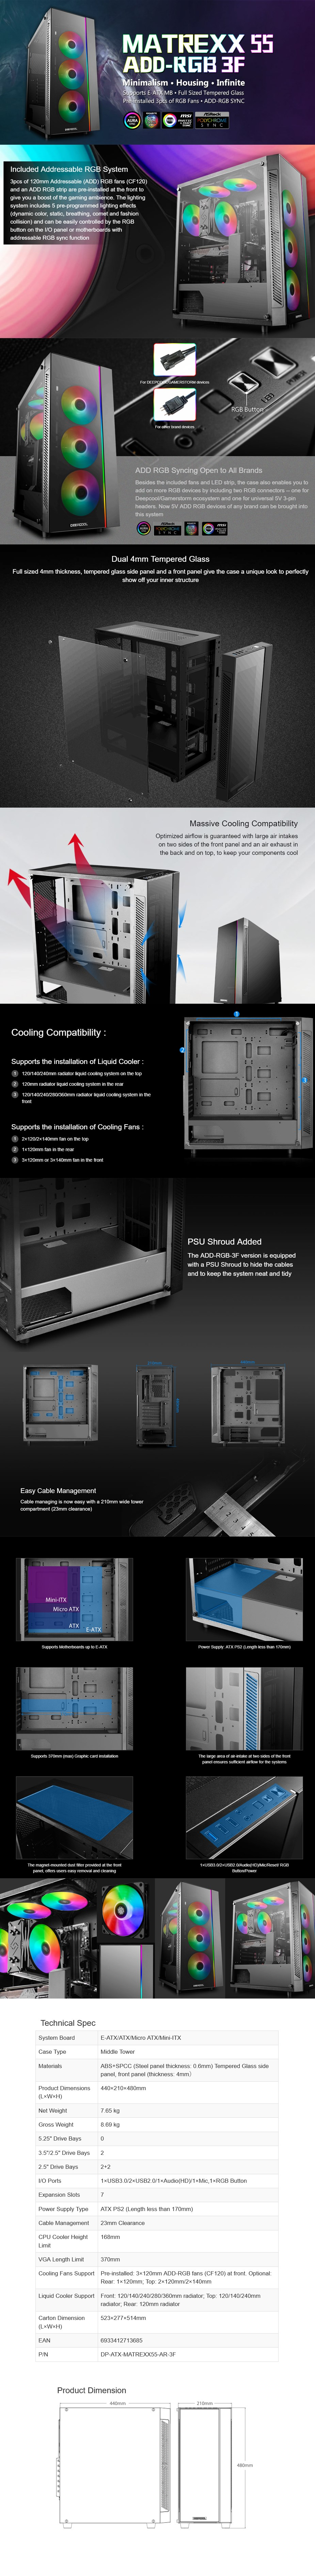 Deepcool Matrexx 55 ADD-RGB 3F Tempered Glass Mid-Tower E-ATX Case - Desktop Overview 1